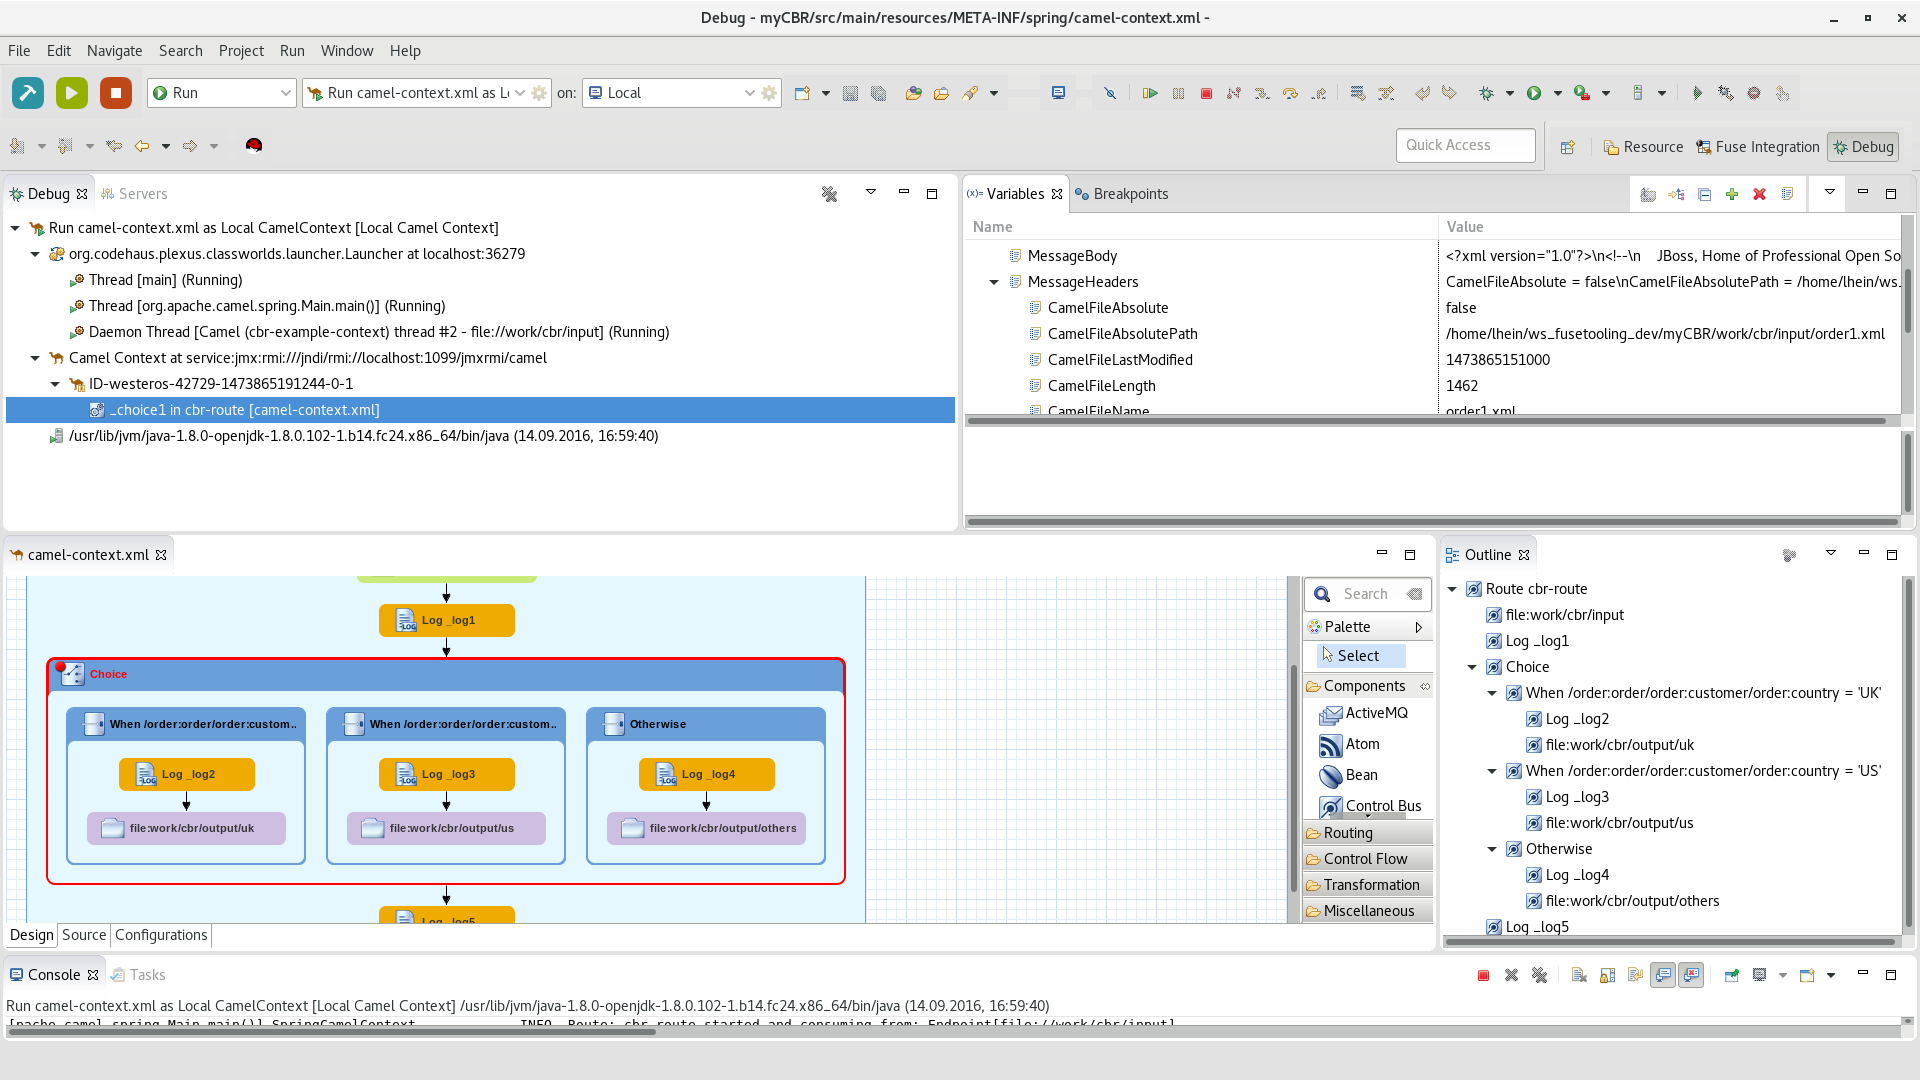 JBoss Tools - Fuse Tooling